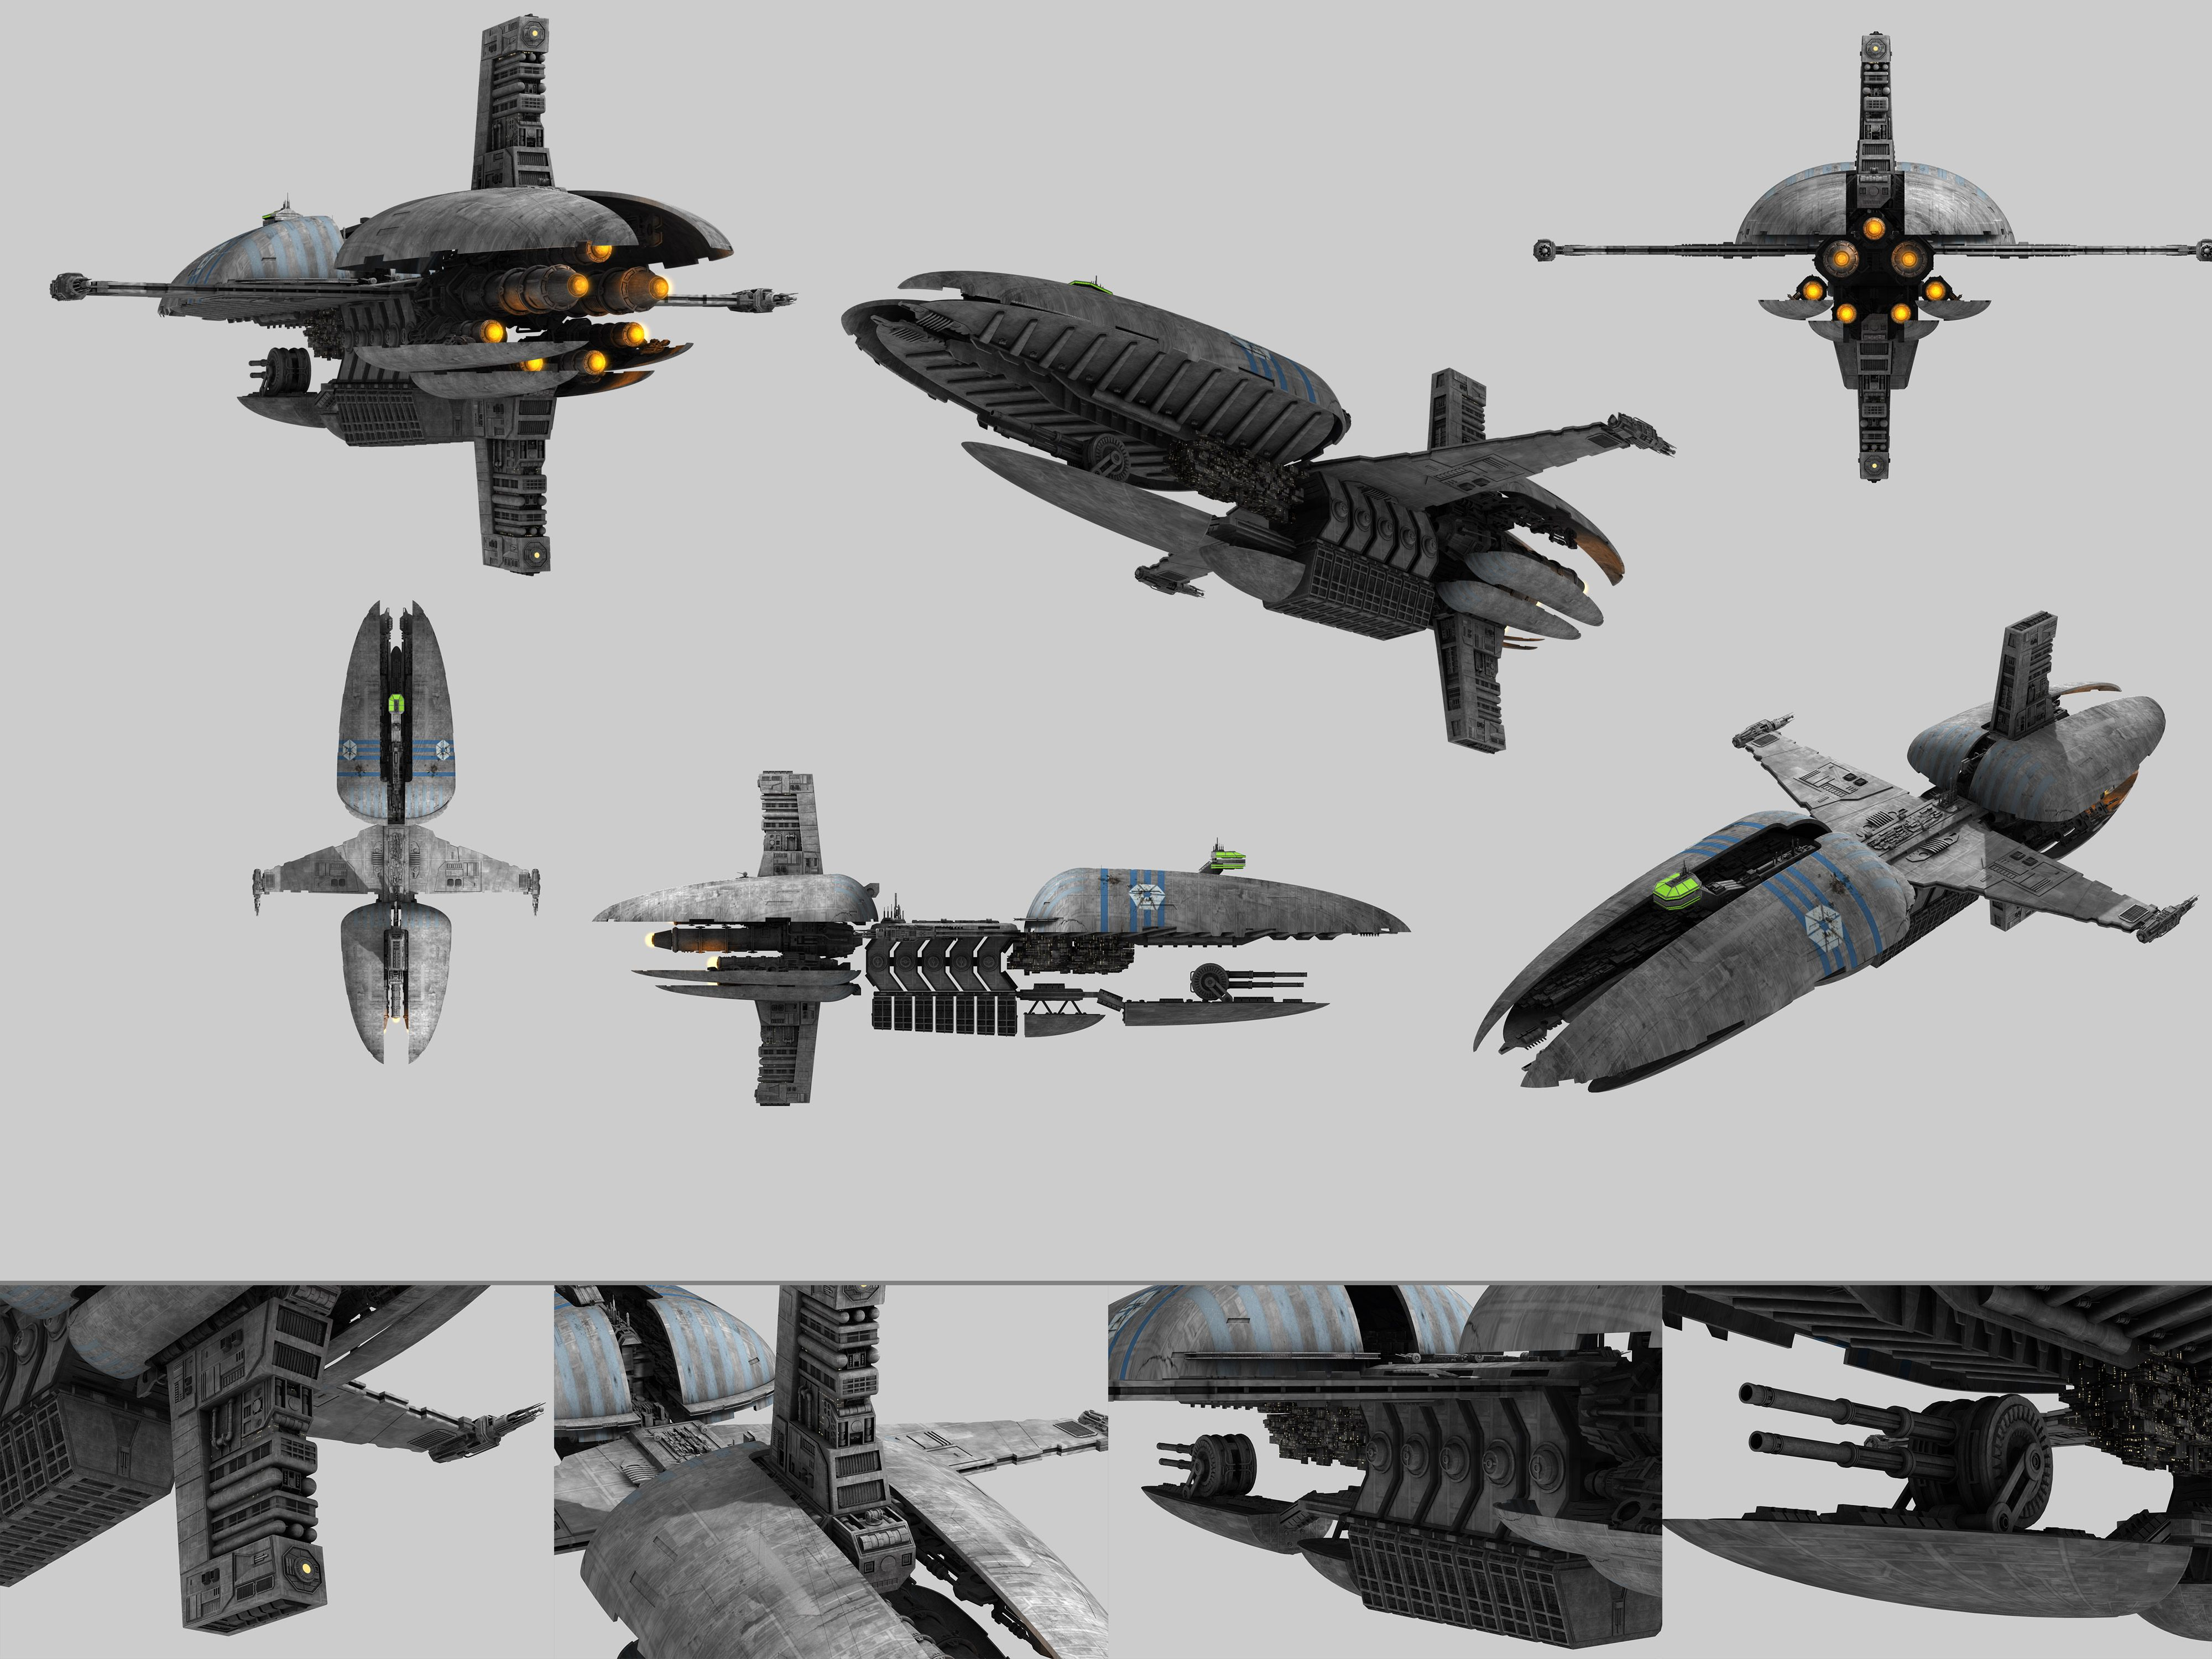 Cis Frigate Munificent Class From Star Wars Ep3 By Enigmator On Deviantart Star Wars Ships Star Wars Vehicles Star Wars Spaceships